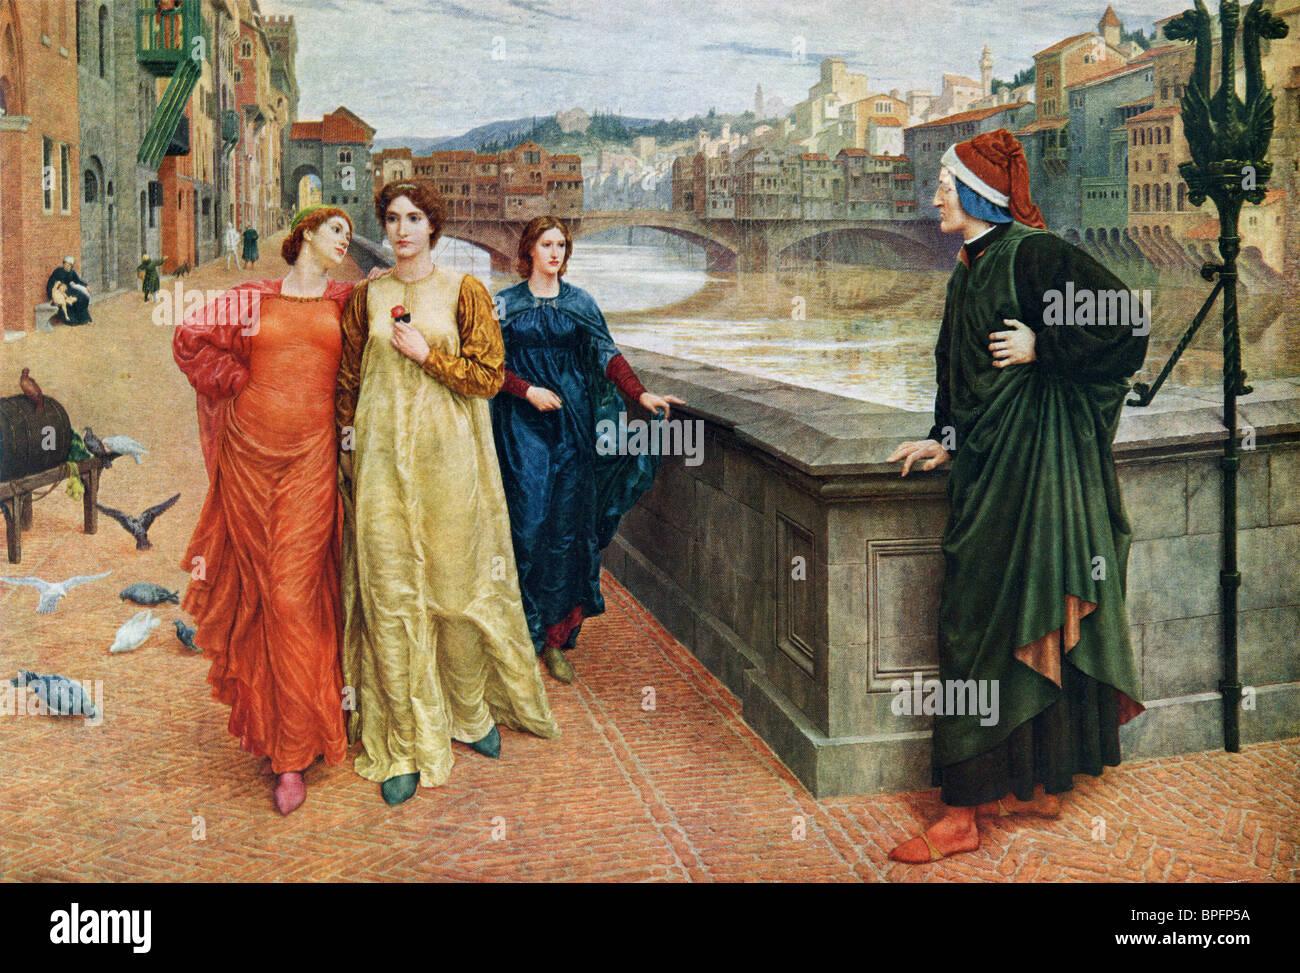 Dante and Beatrice. Dante Alighieri c.1265 – 1321, Italian poet and Beatrice 'Bice' di Folco Portinari 1266 - Stock Image